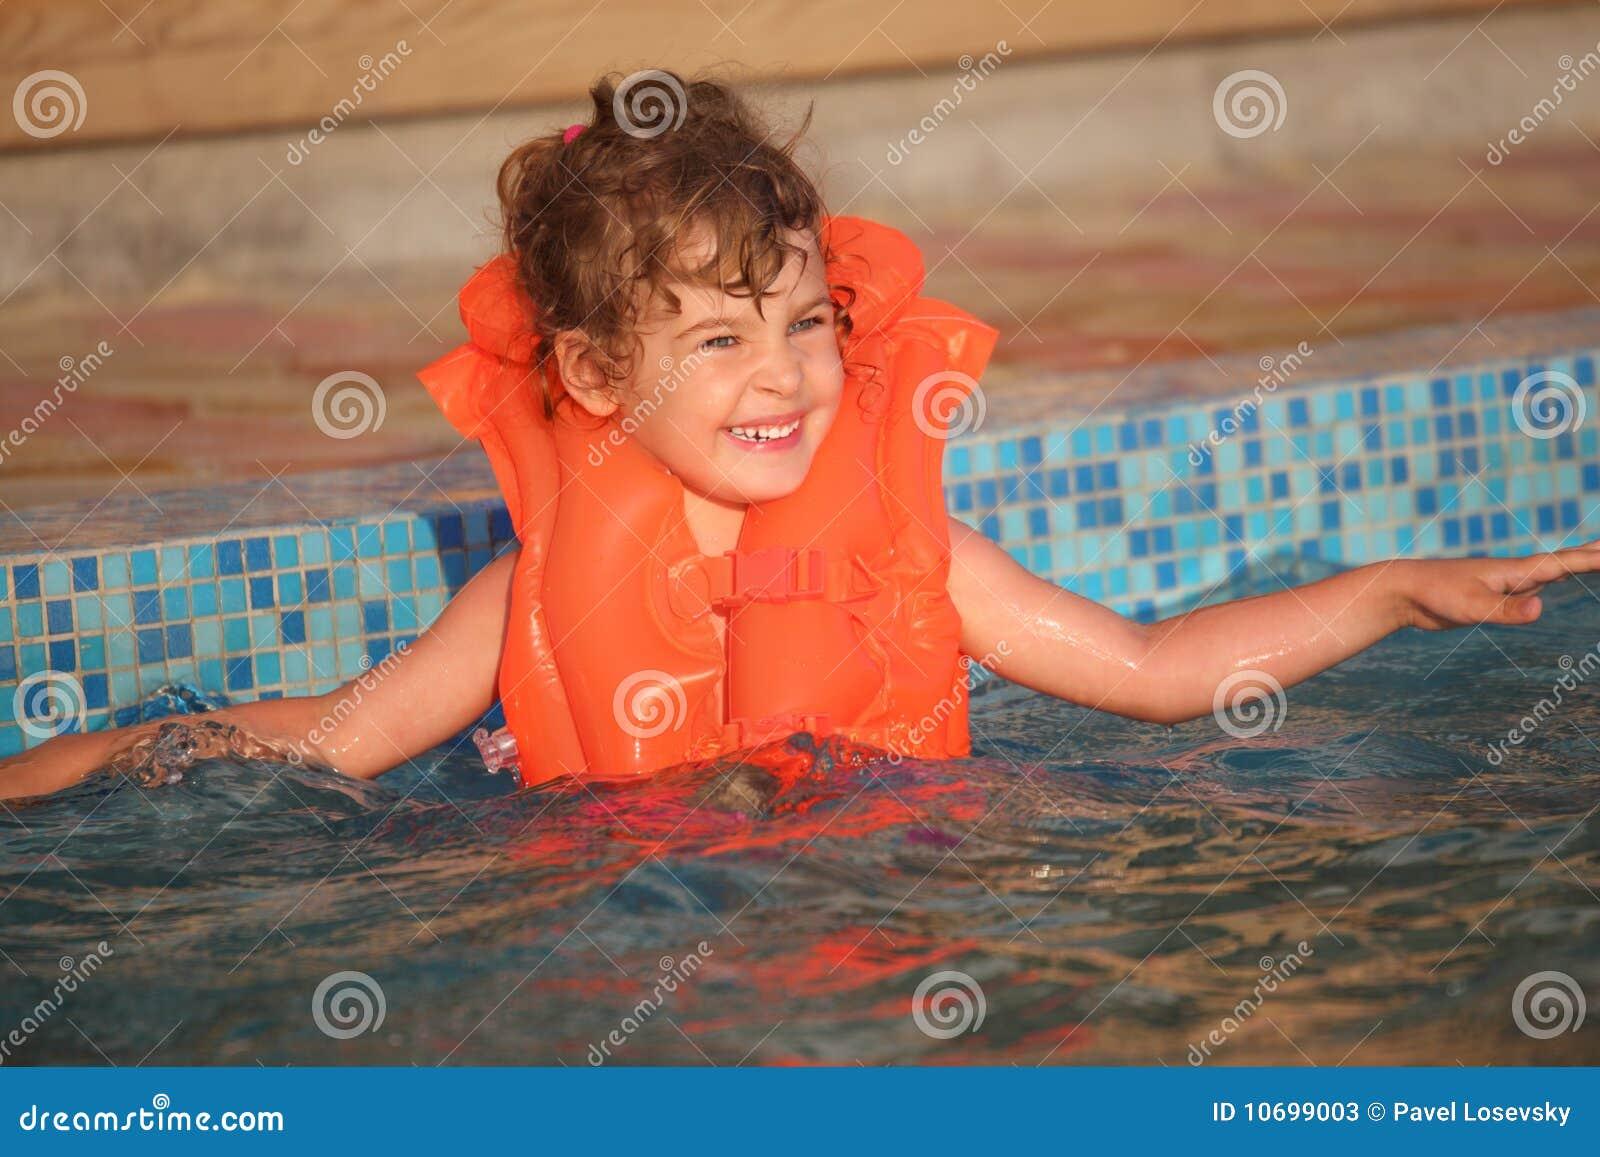 Meisje in opblaasbaar vest in pool